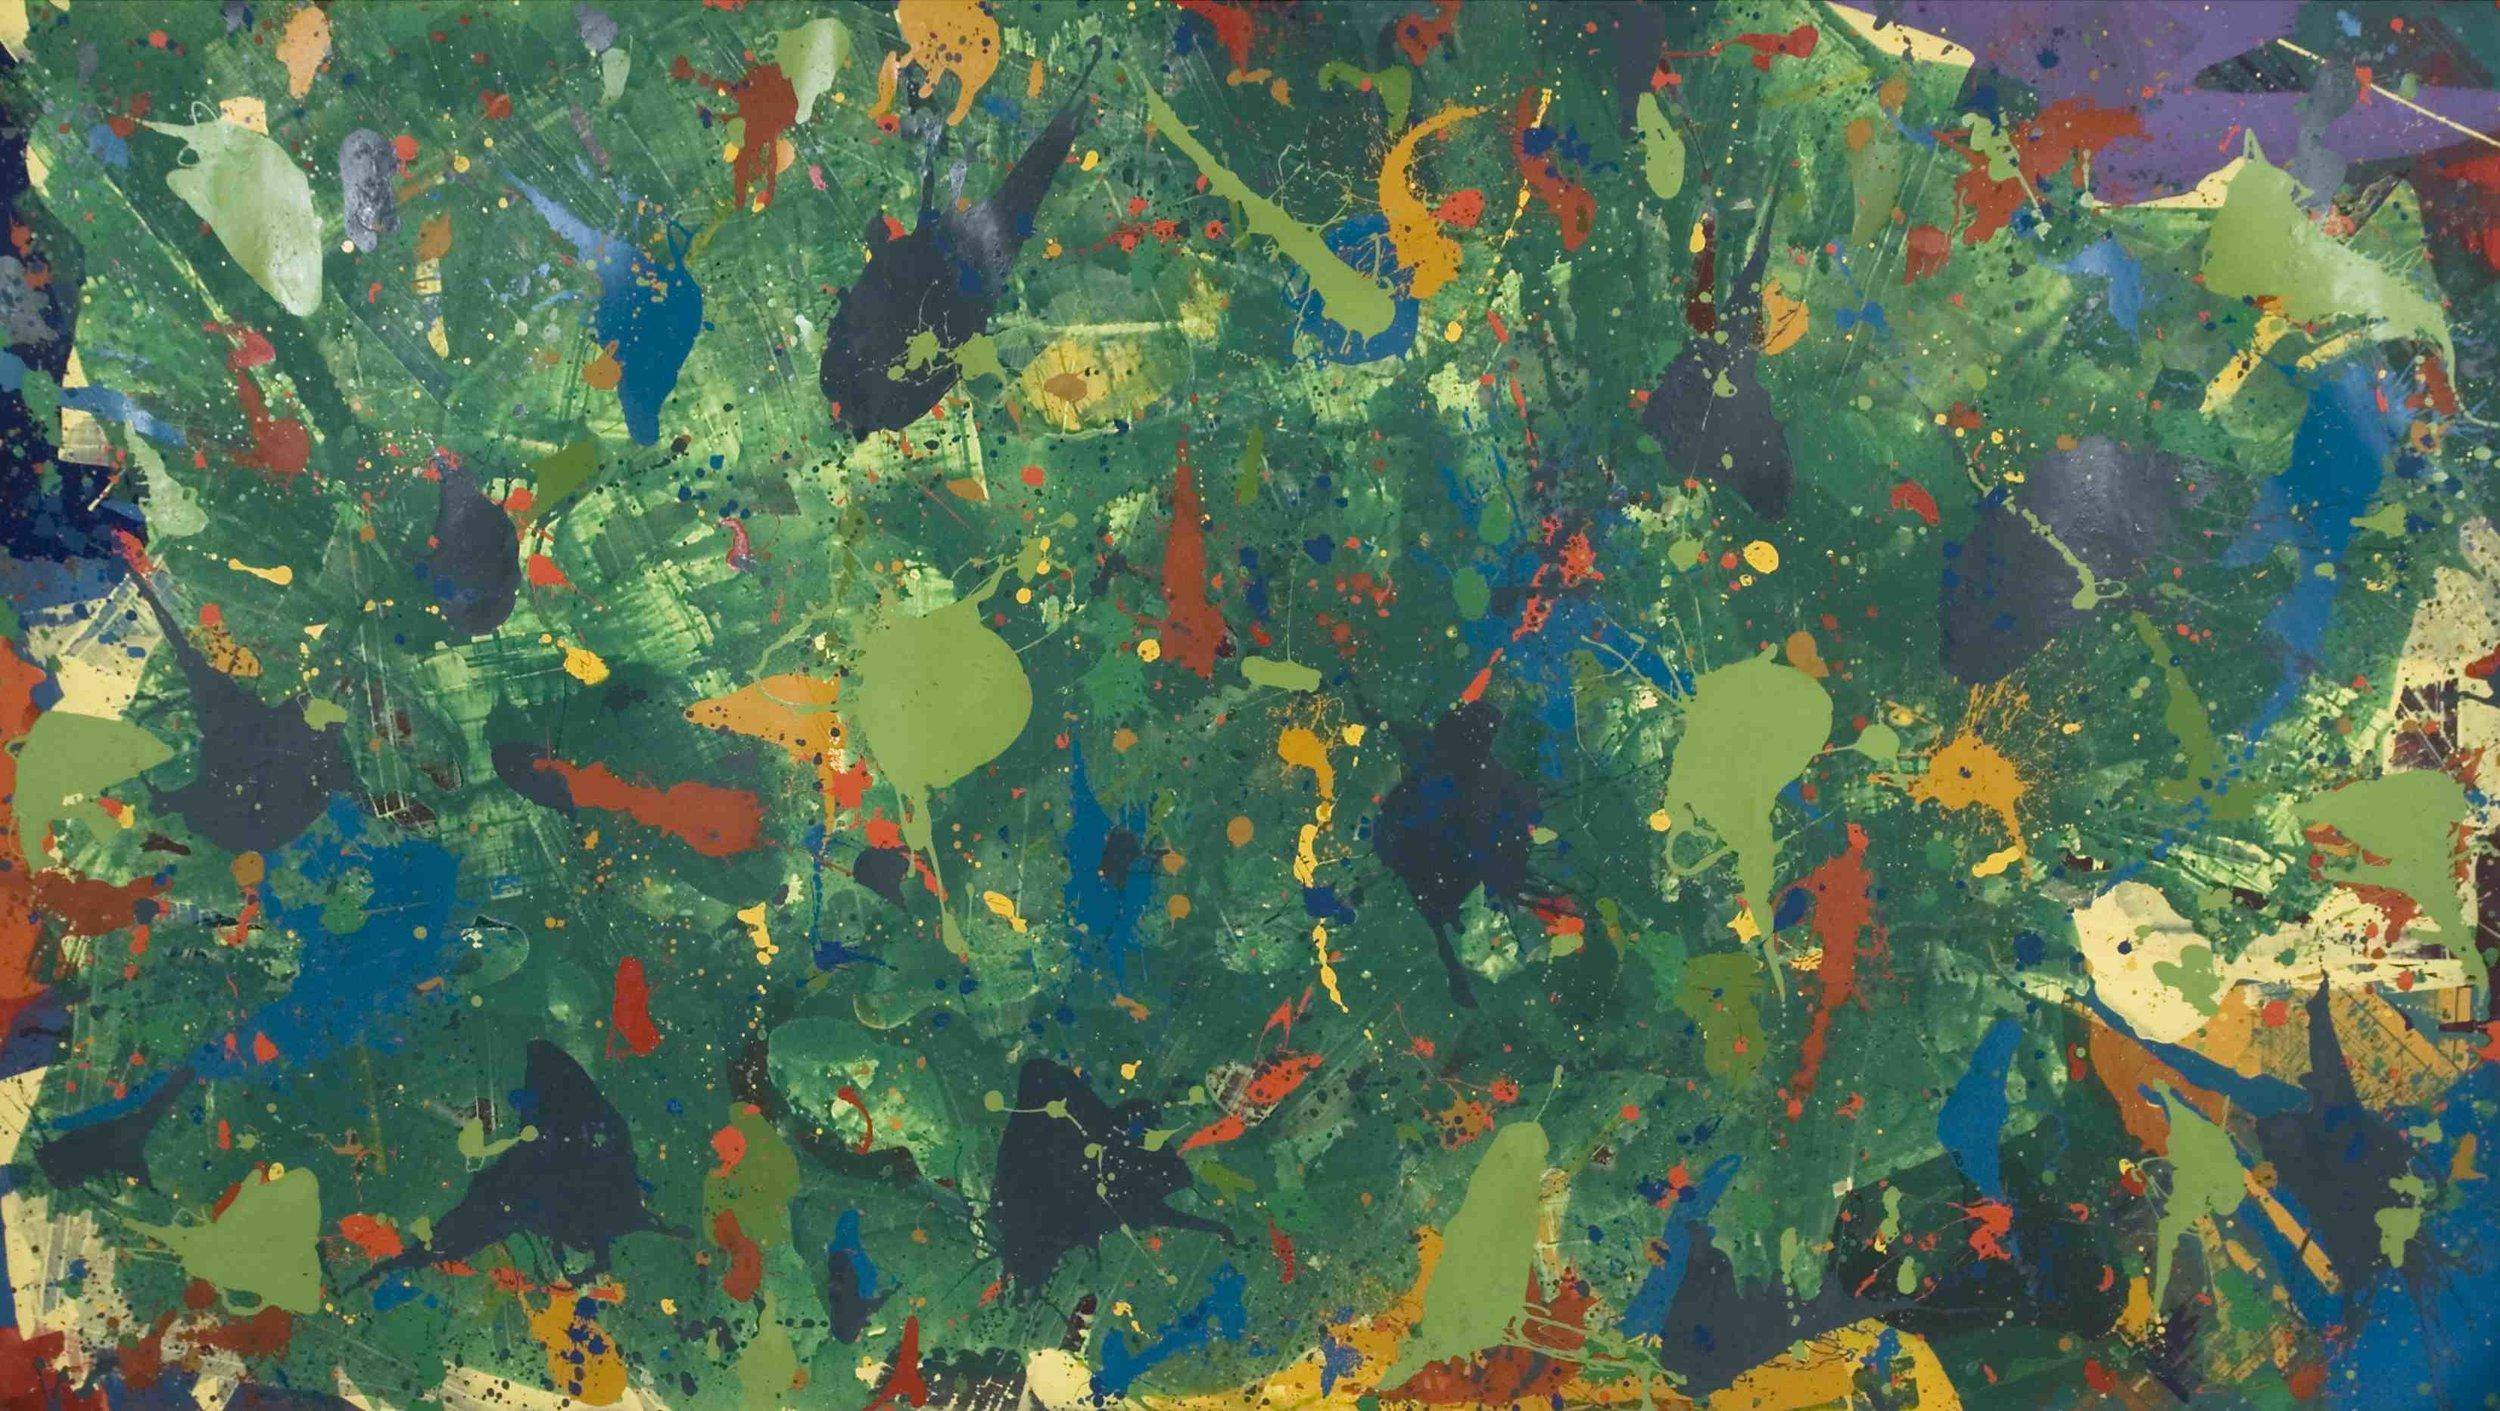 Journey Through Green , 1974-75, acrylic and enamel on canvas, 271 x 480 cm.